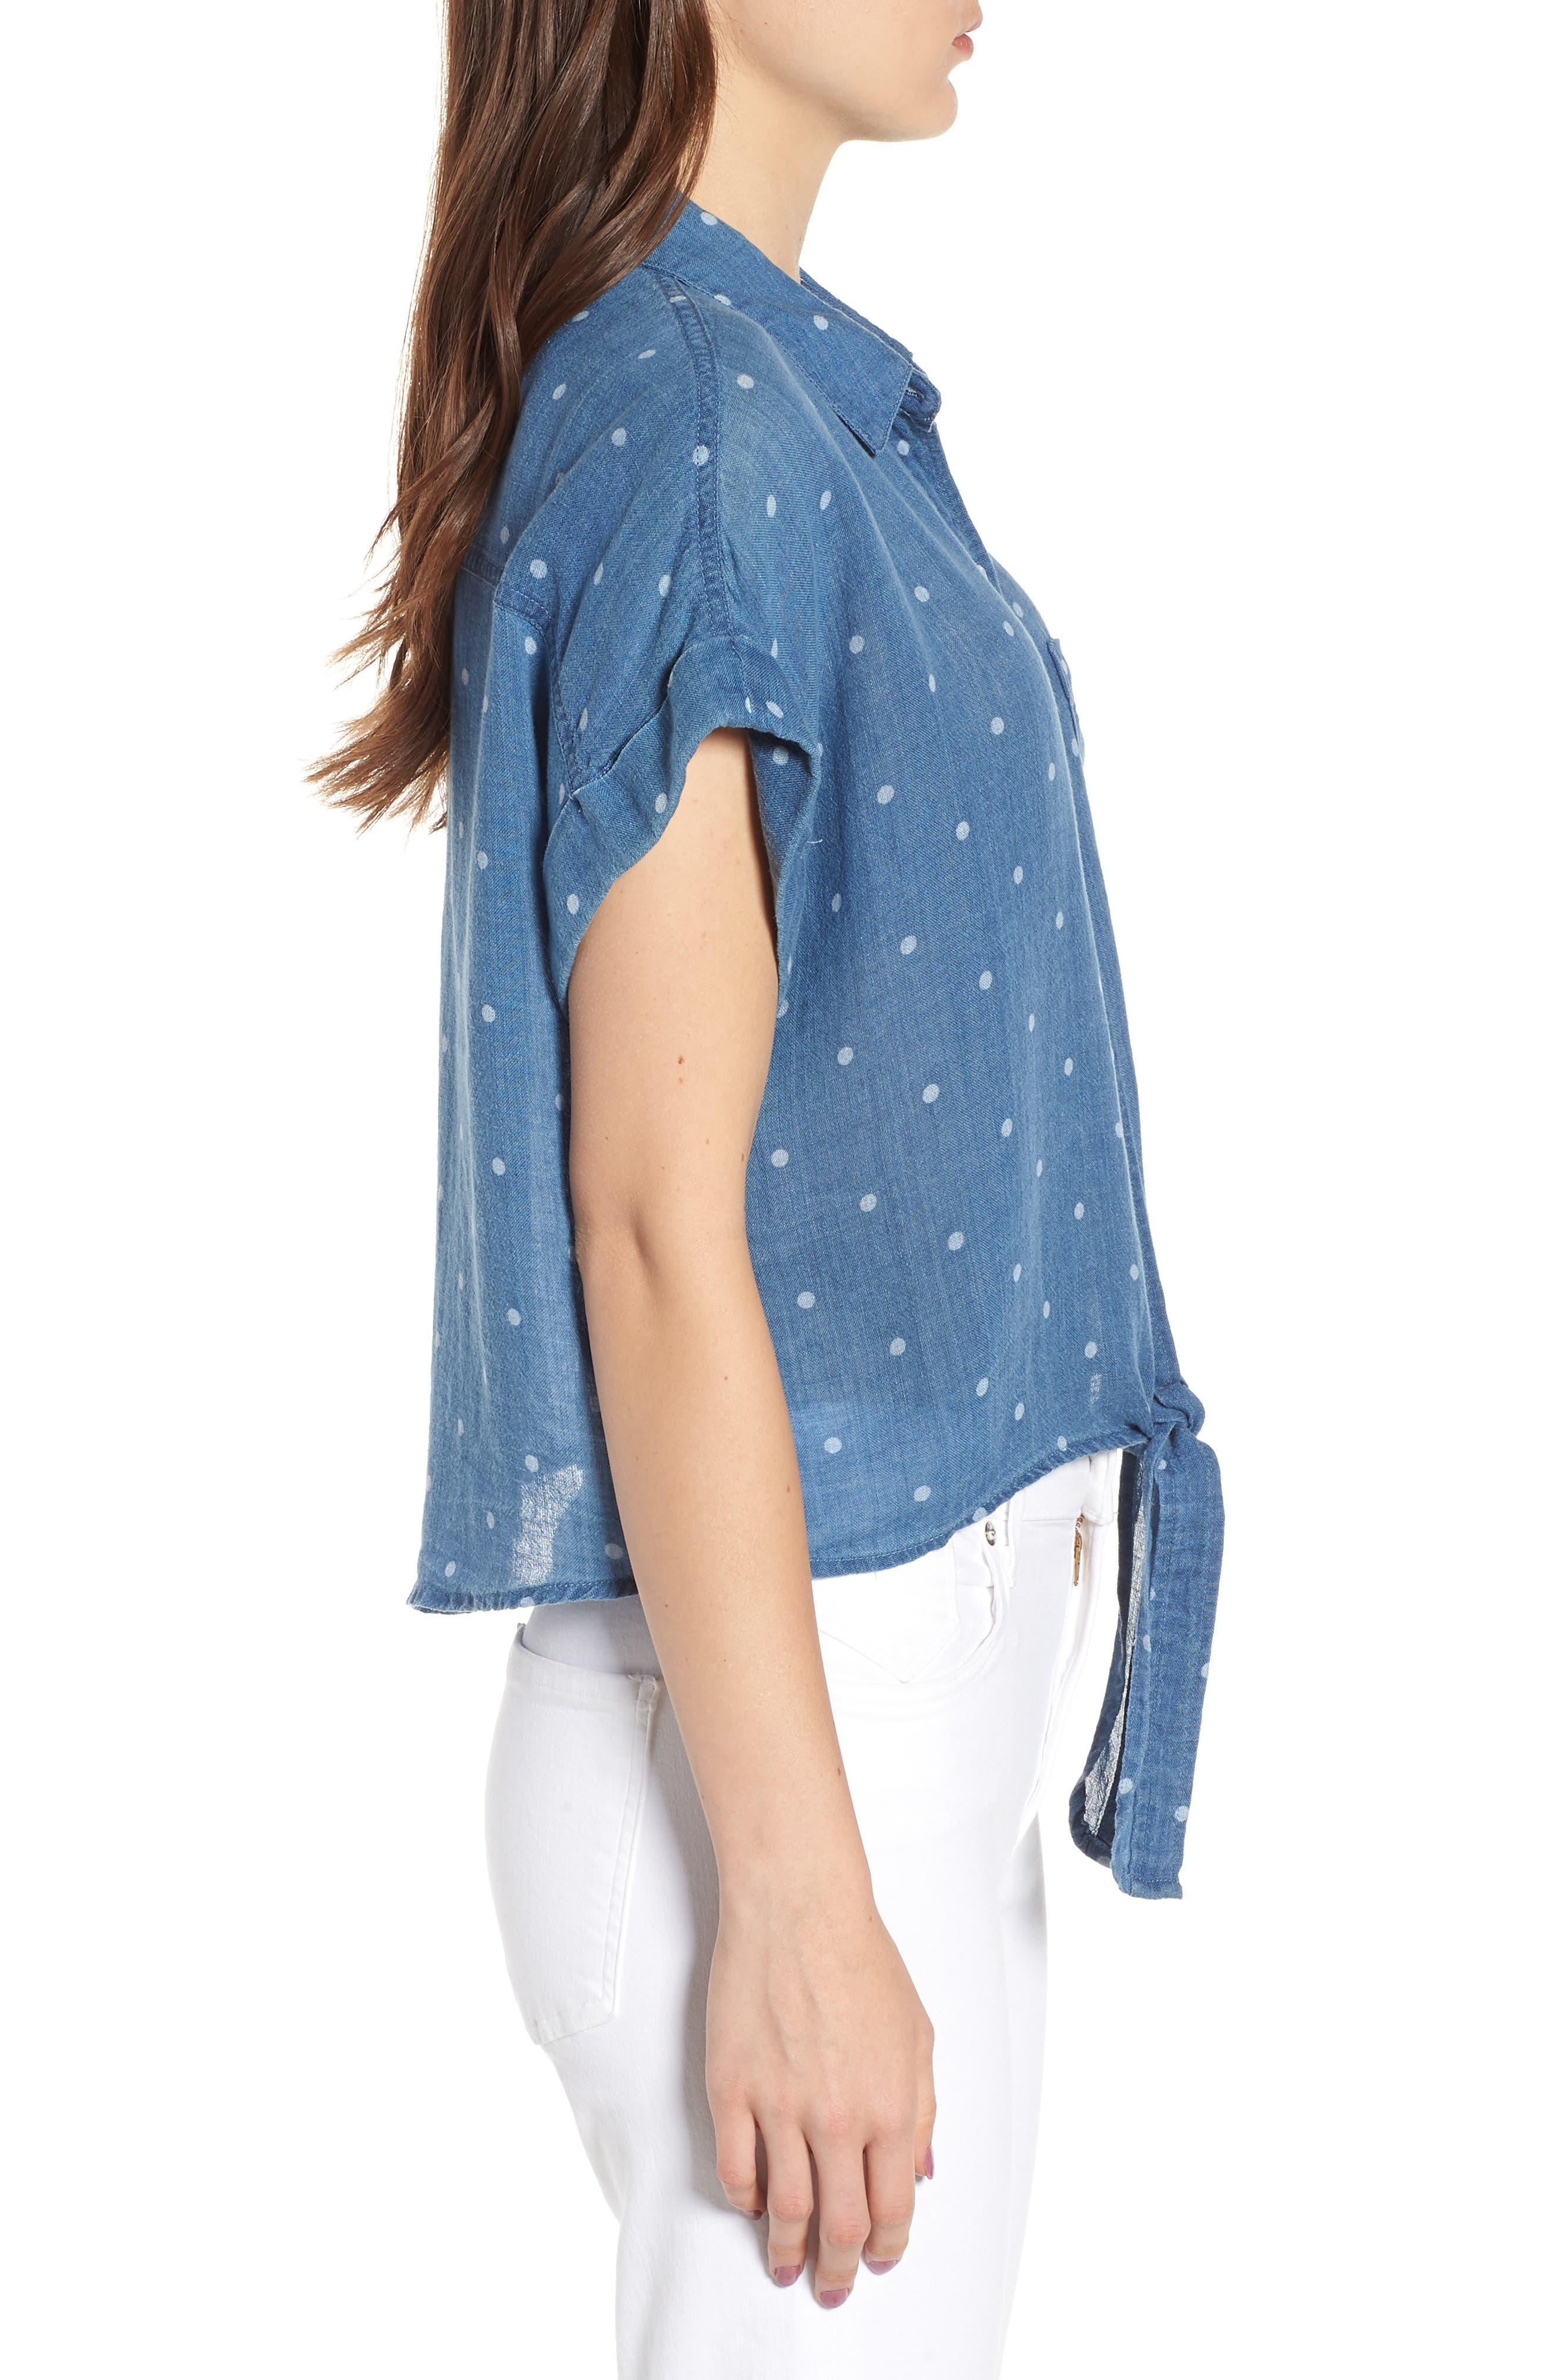 Amelie Tie Front Shirt,                             Alternate thumbnail 3, color,                             INDIGO WHITE POLKA DOTS